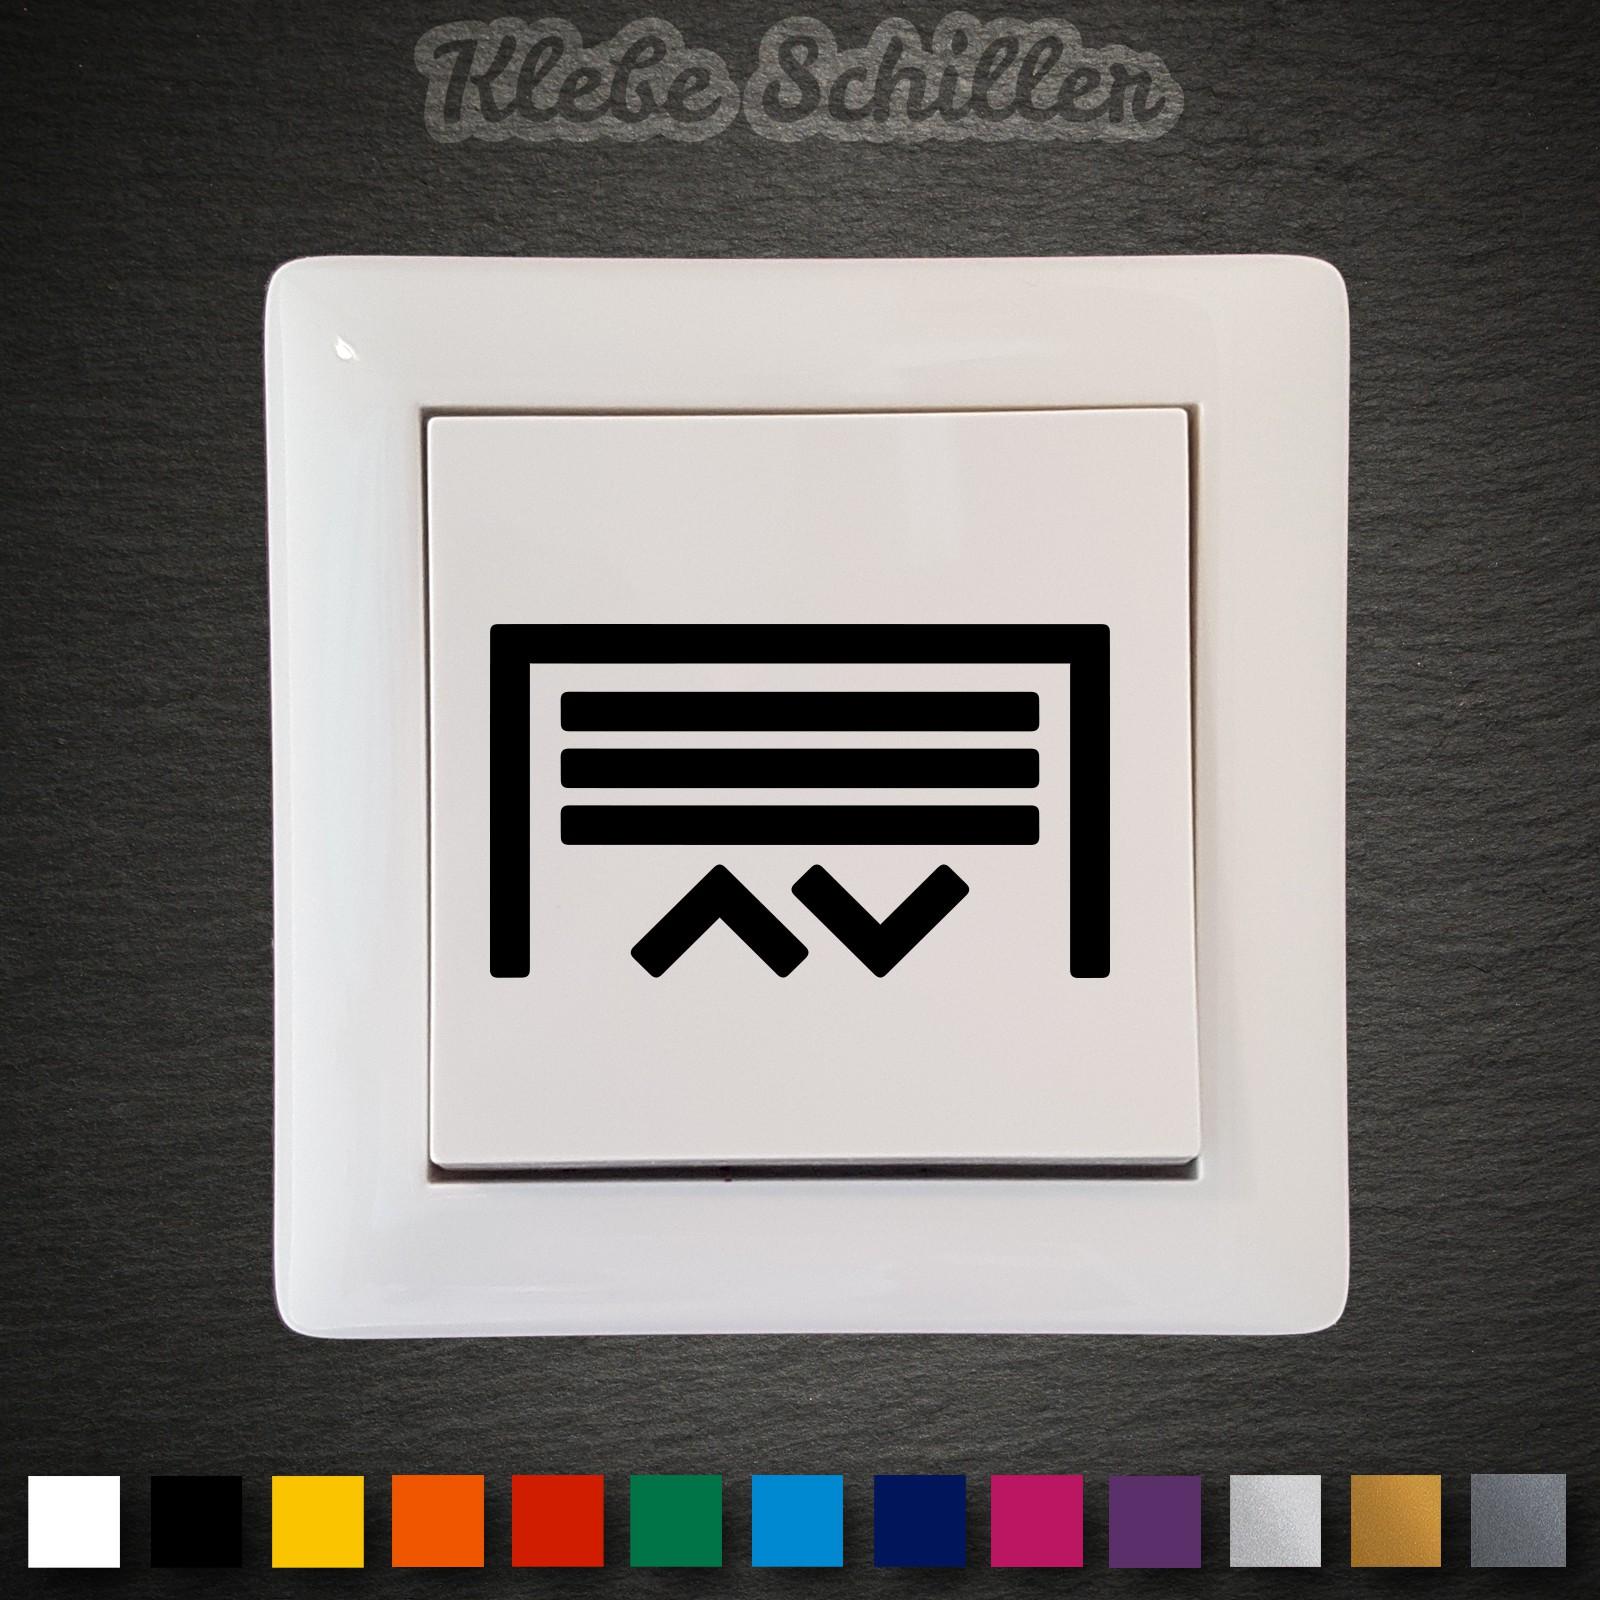 14418 Garagentor Aufkleber 45x26mm Schalter Taster Symbole Tor ...